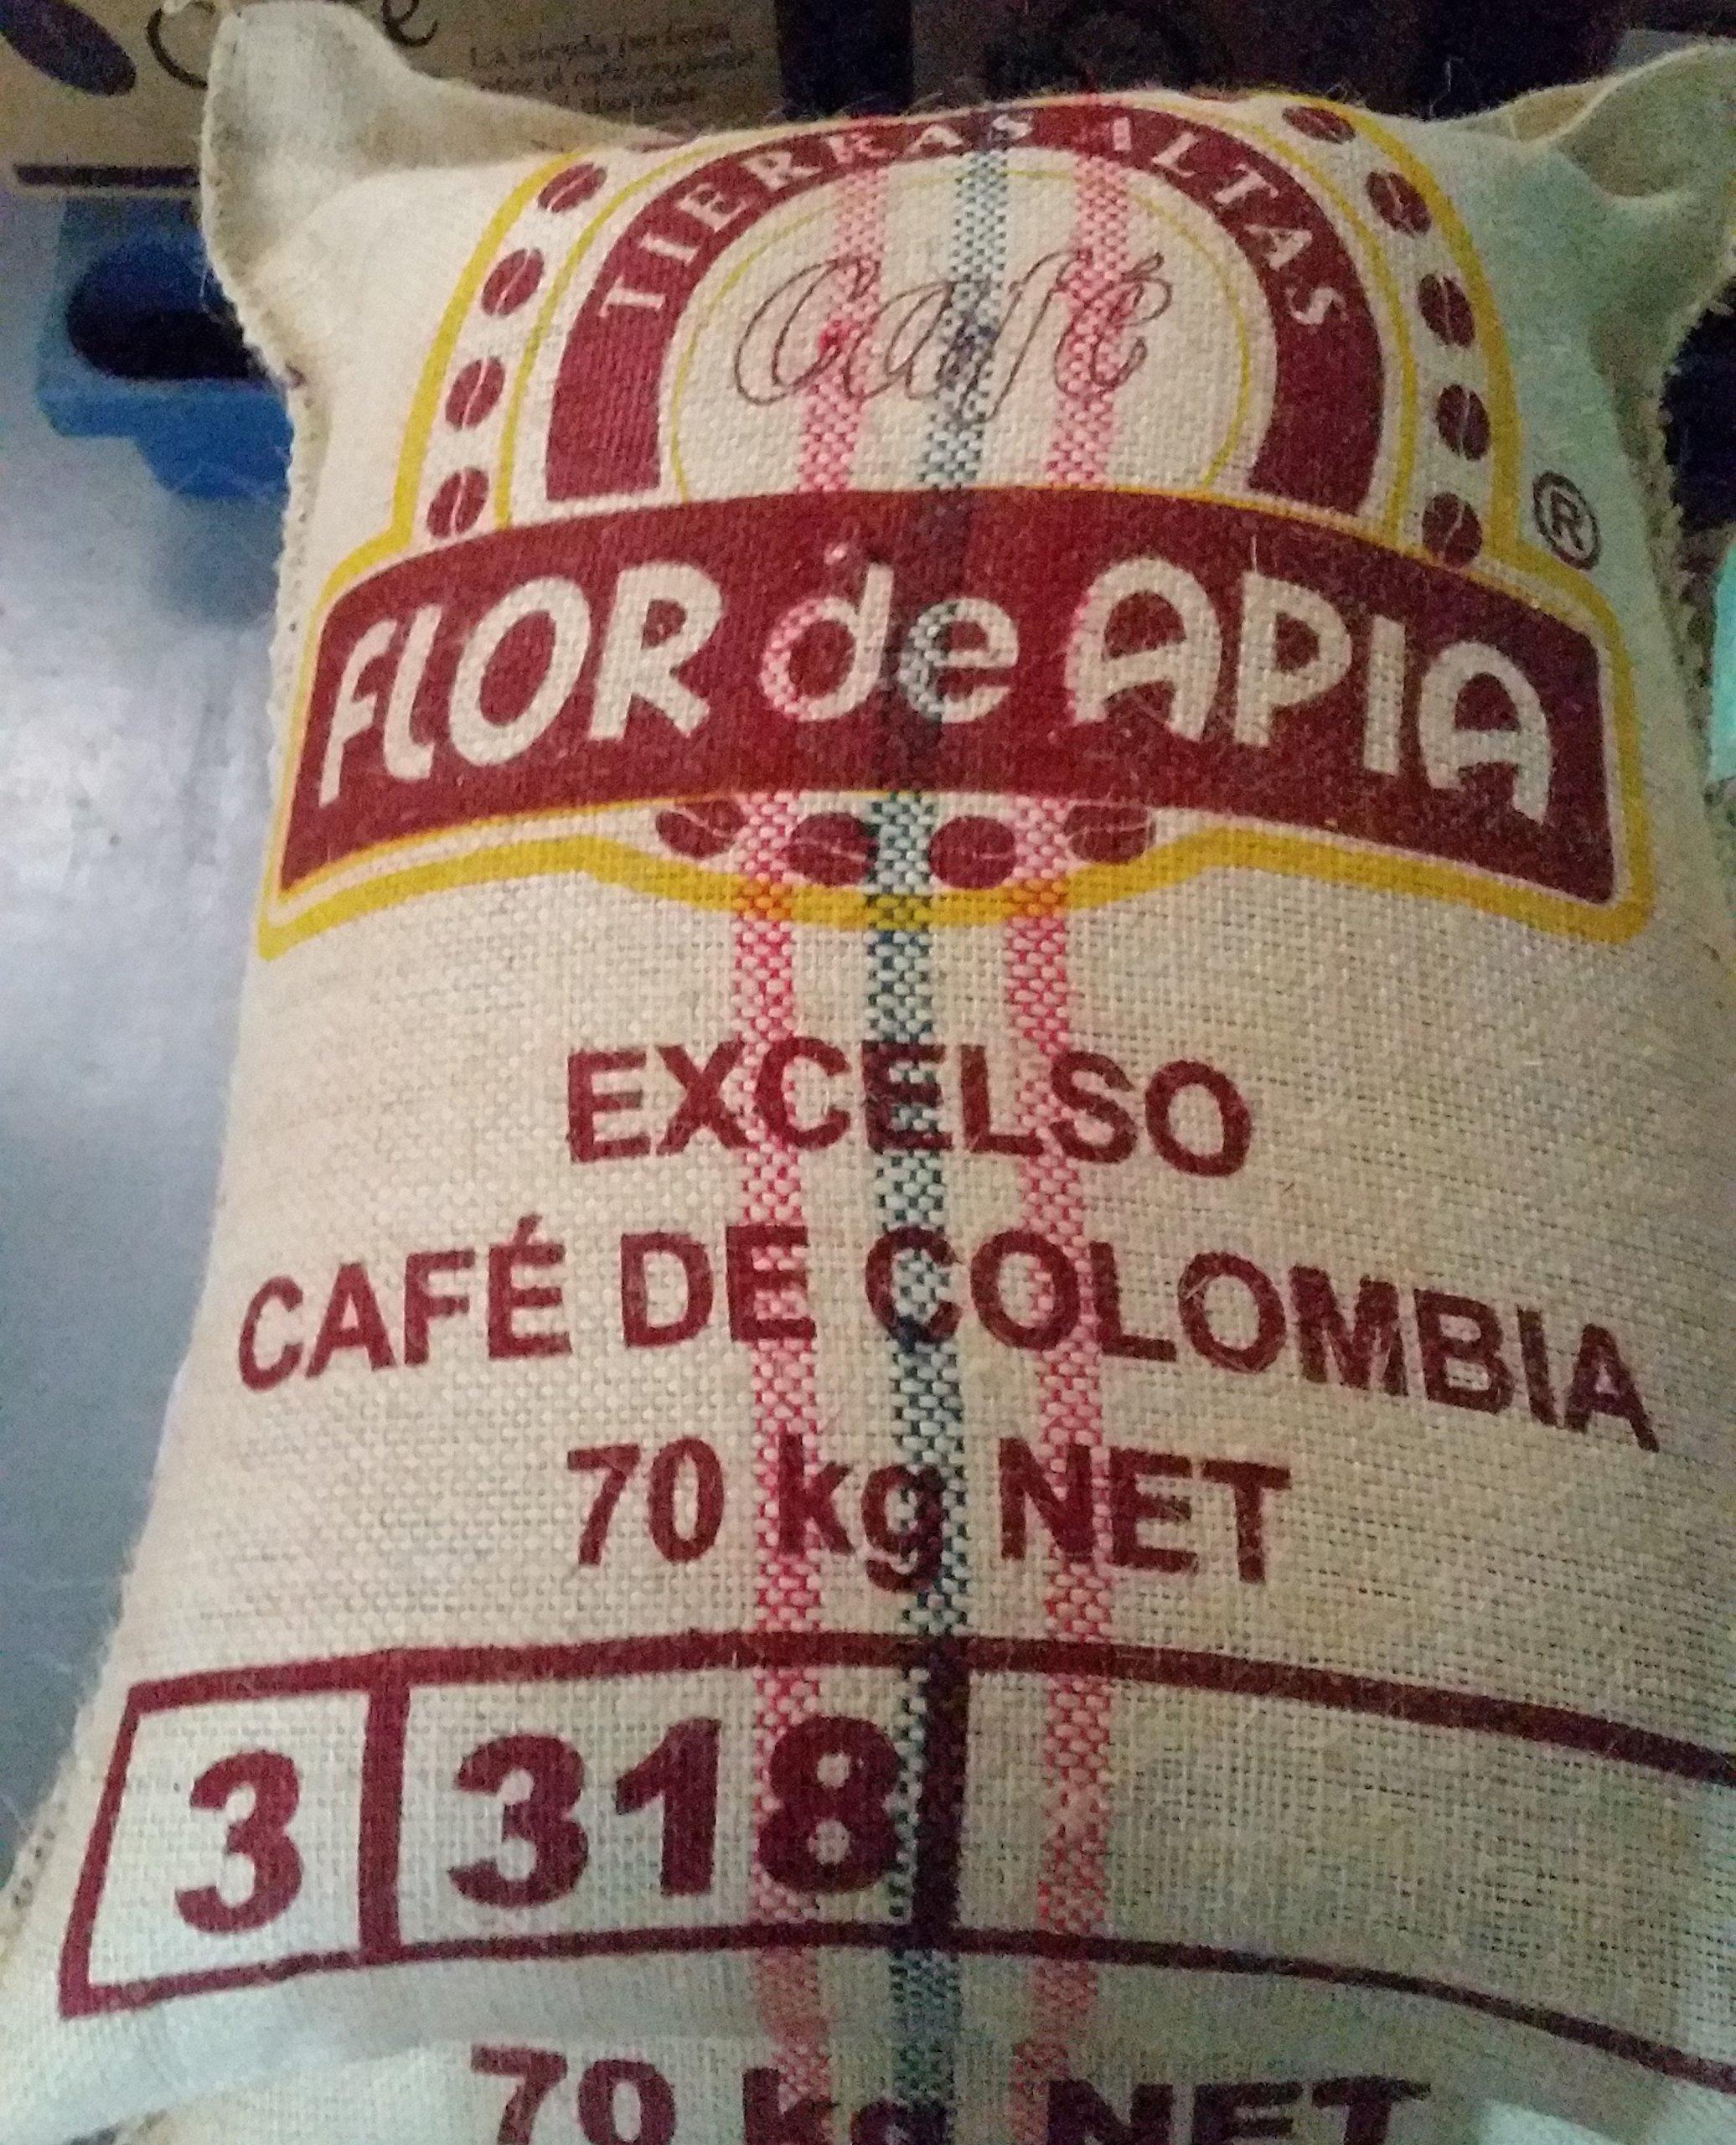 Single Origin Coffee, Colombian Unroasted Coffee Beans Farm Los Pirineos (50 Lb)